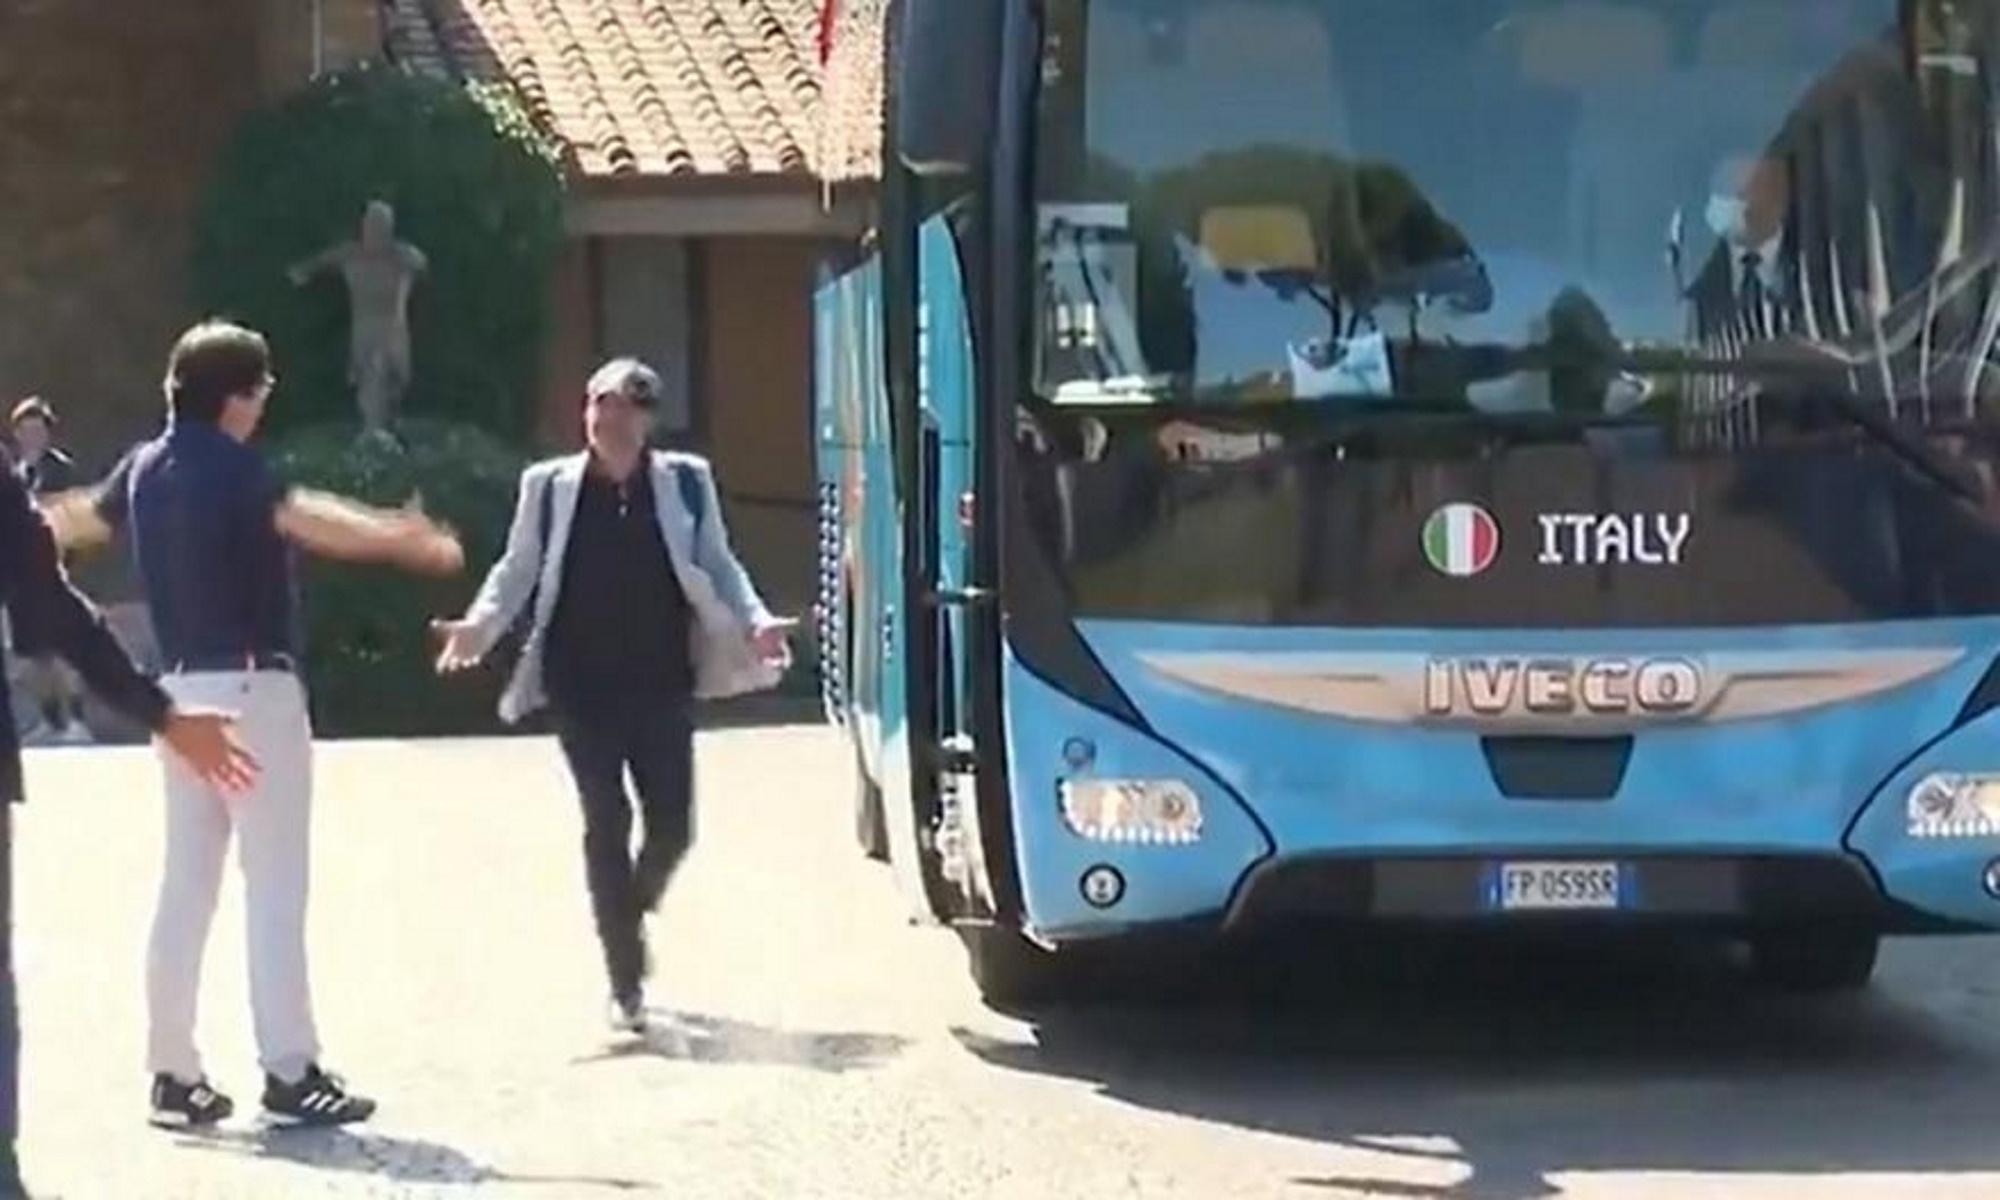 Euro 2020: Το πούλμαν της Ιταλίας πήγε να φύγει χωρίς τον Βιάλι για «γούρι»